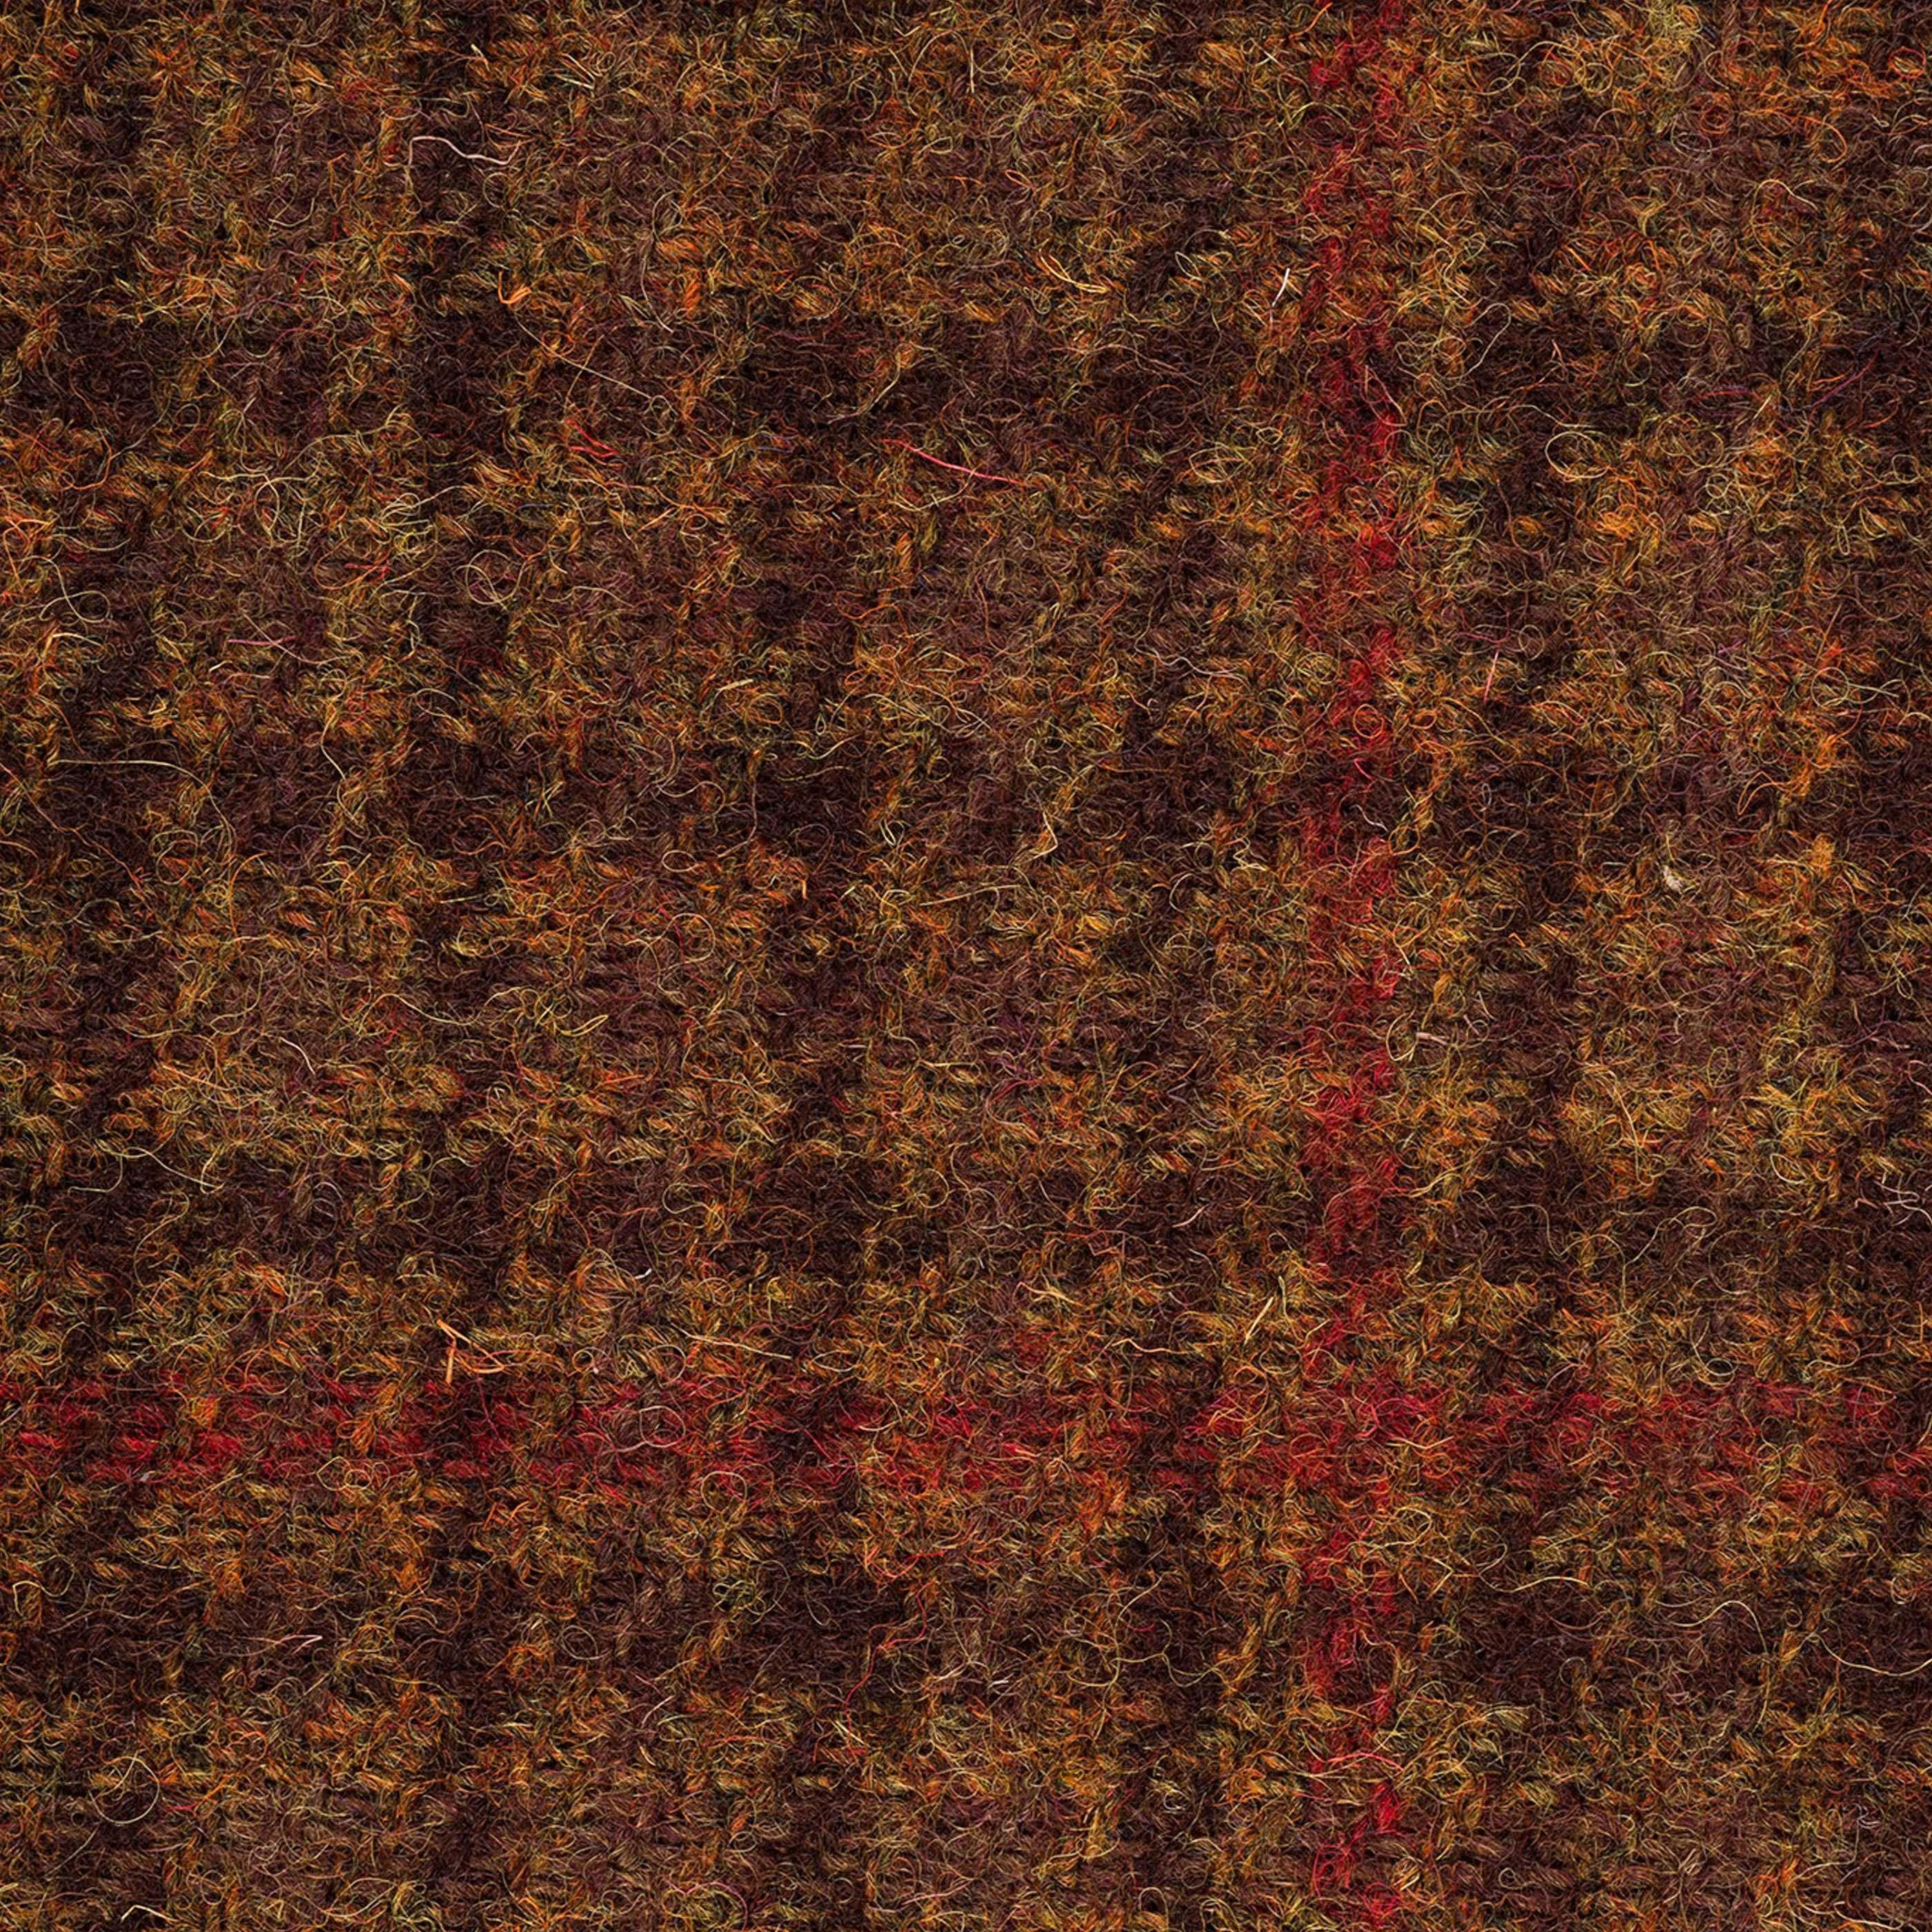 Harris Tweed: An artisan, luxury cloth.